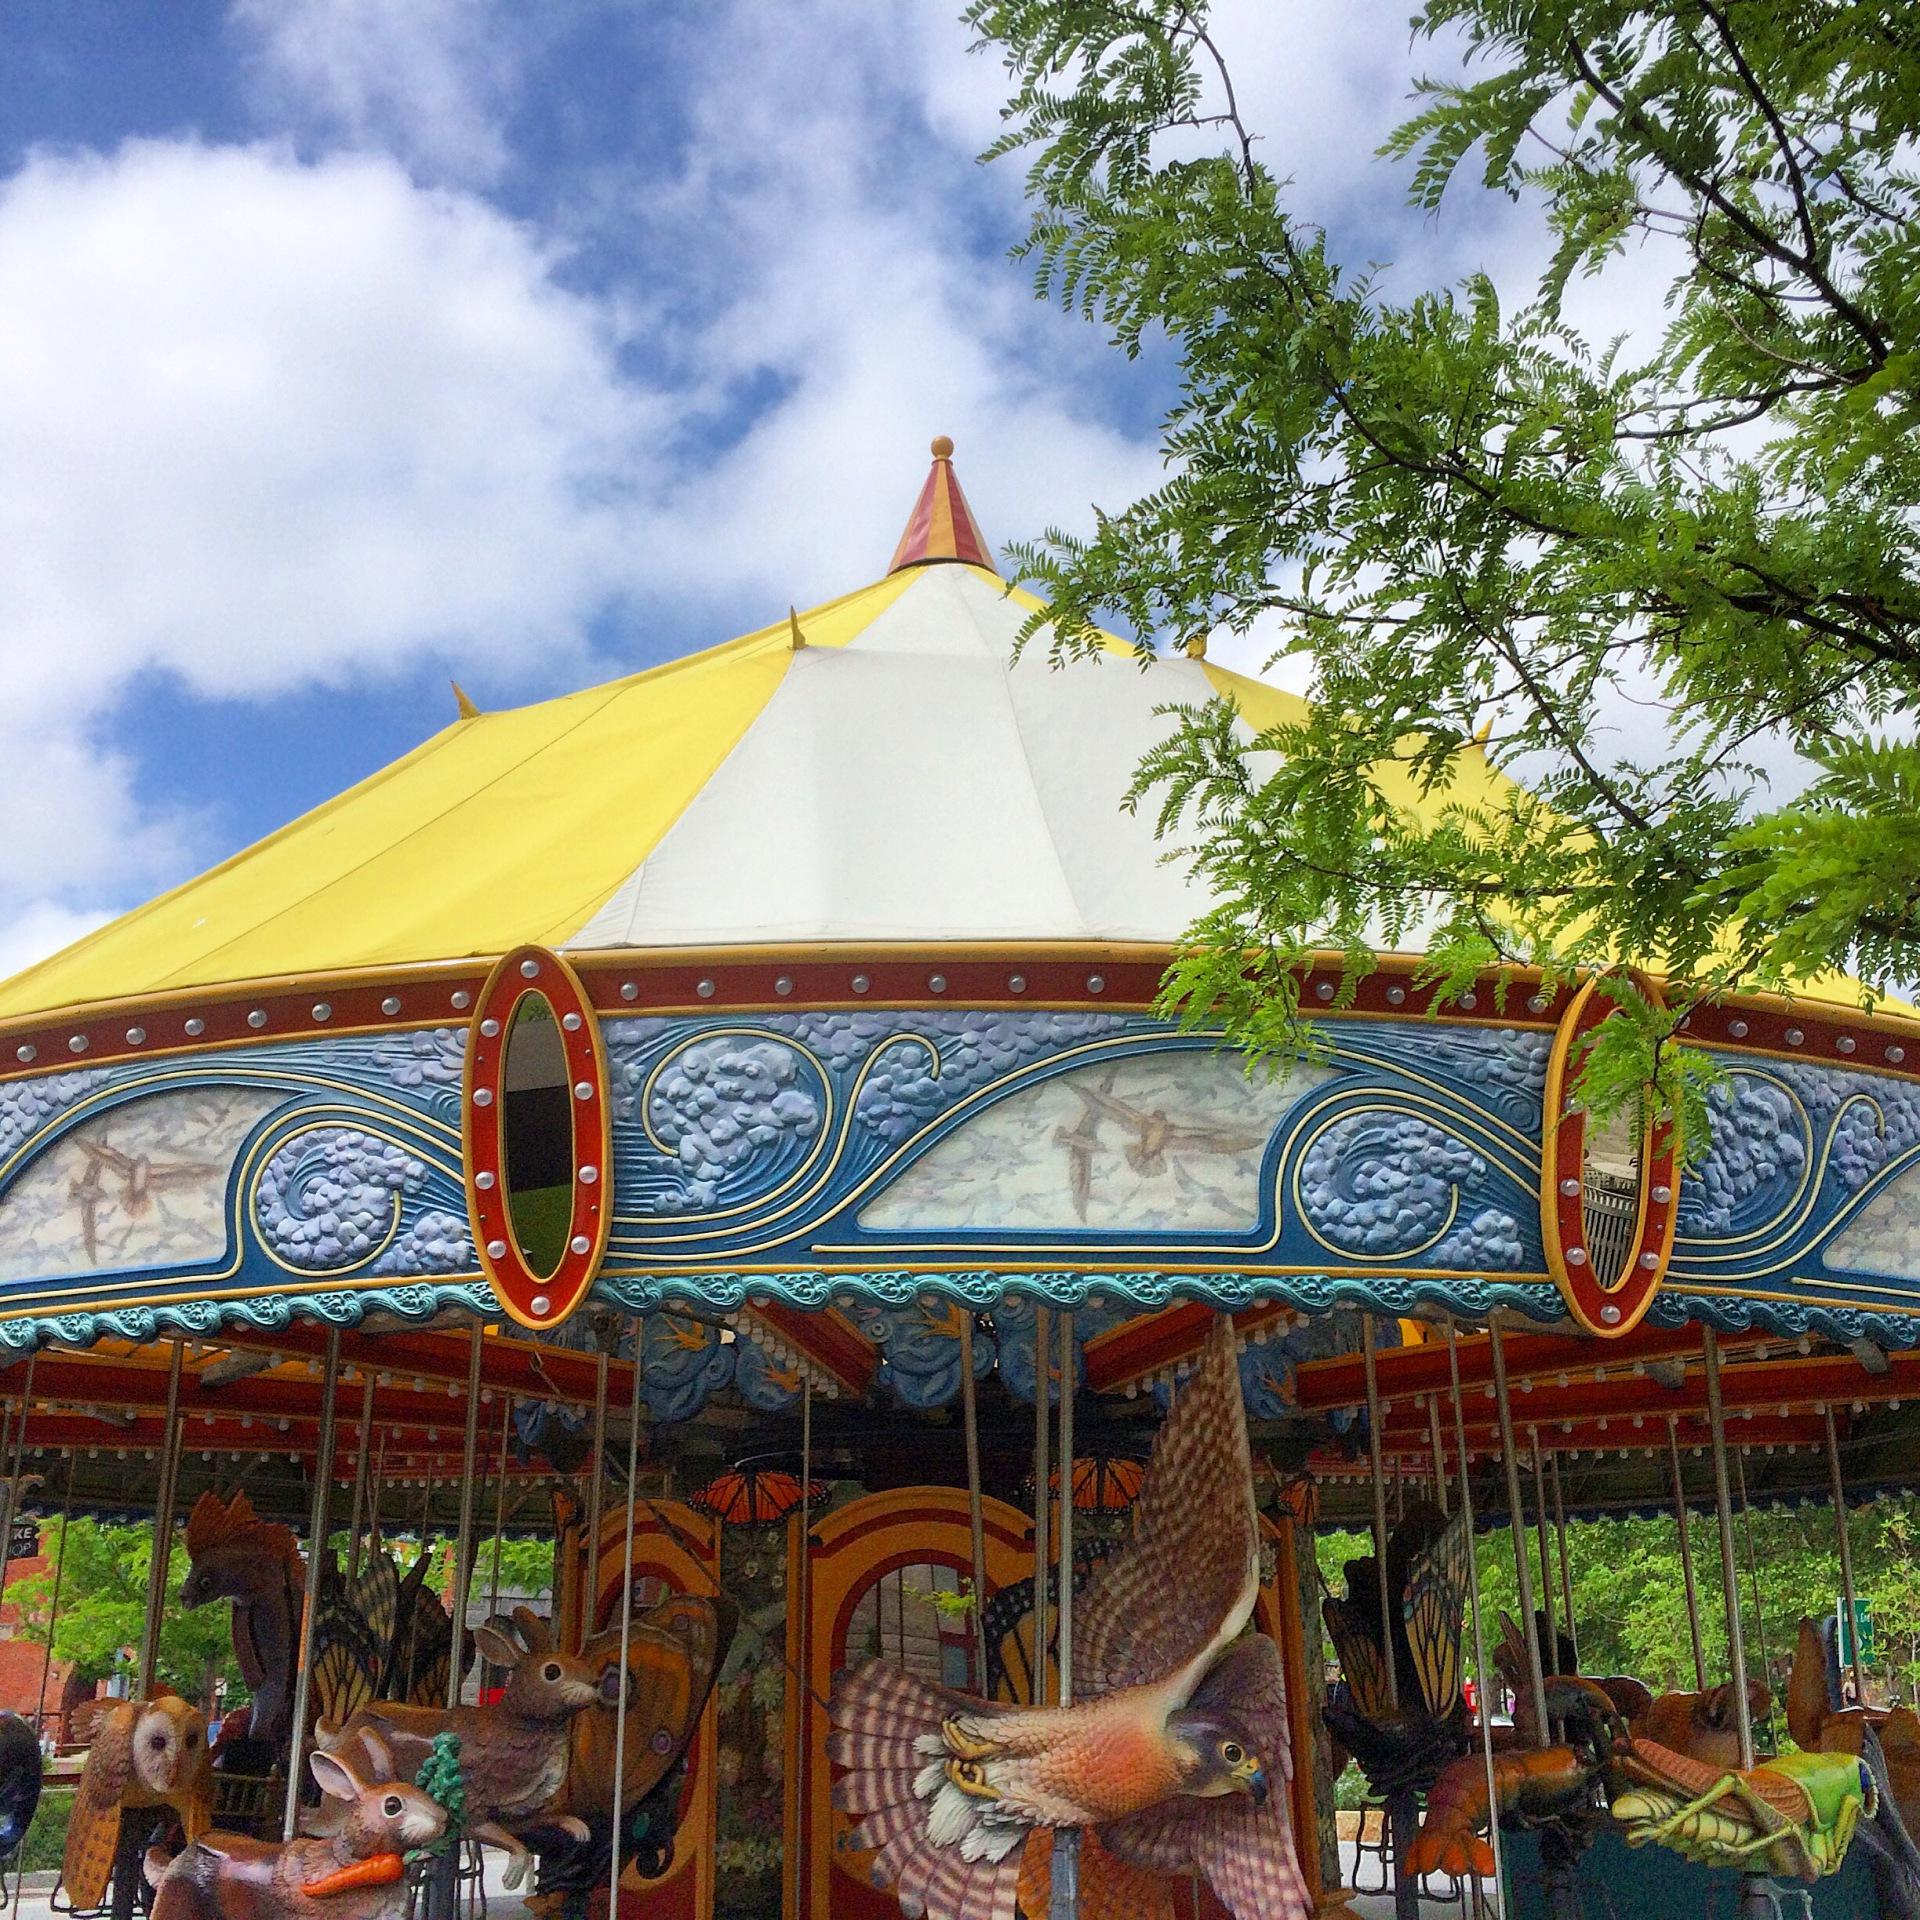 The Greenway Carousel